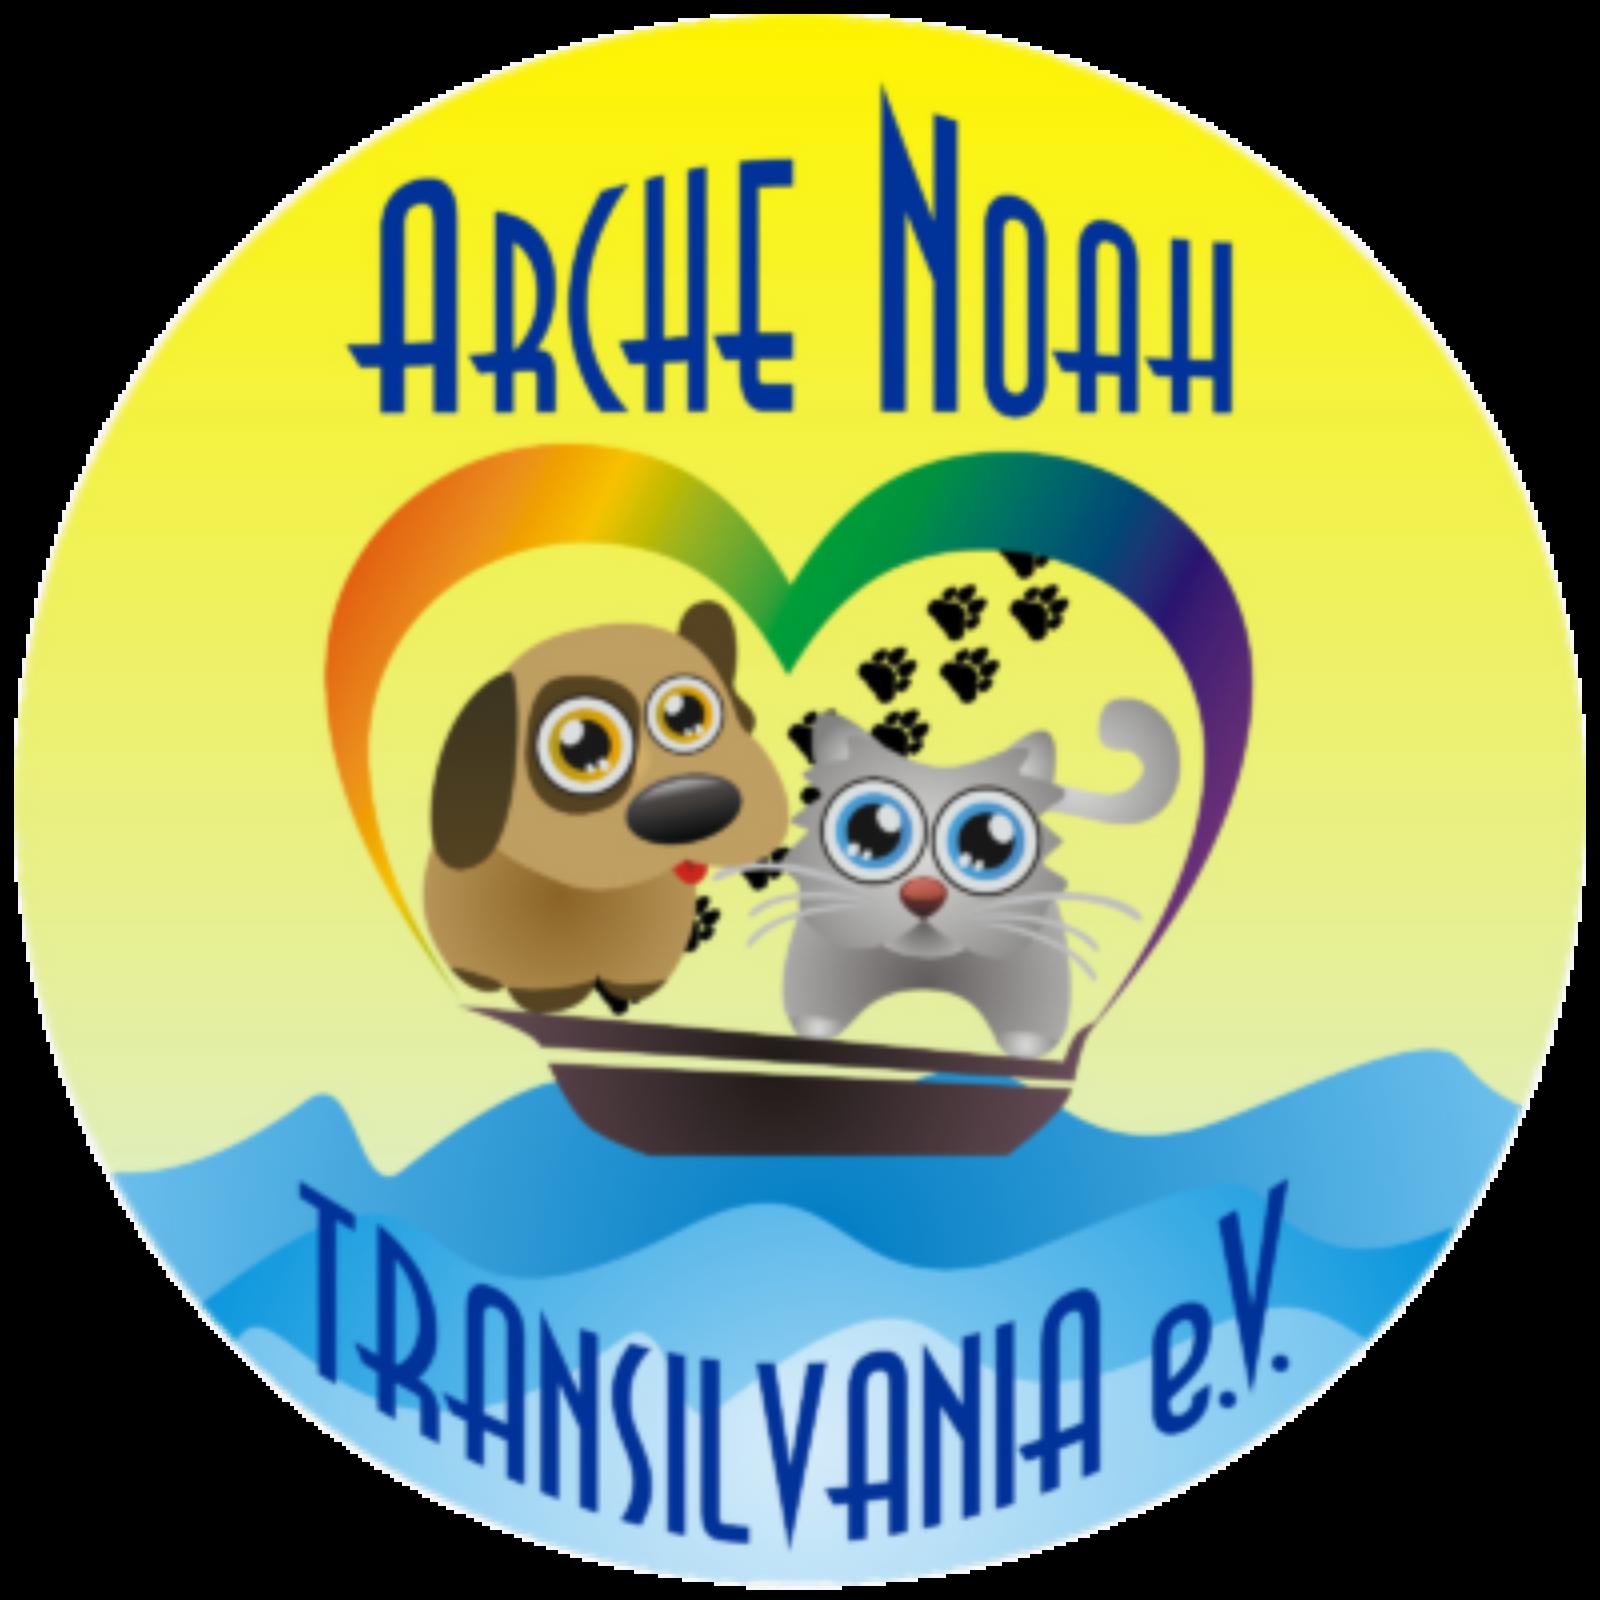 Arche Noah Transilvania e.V.